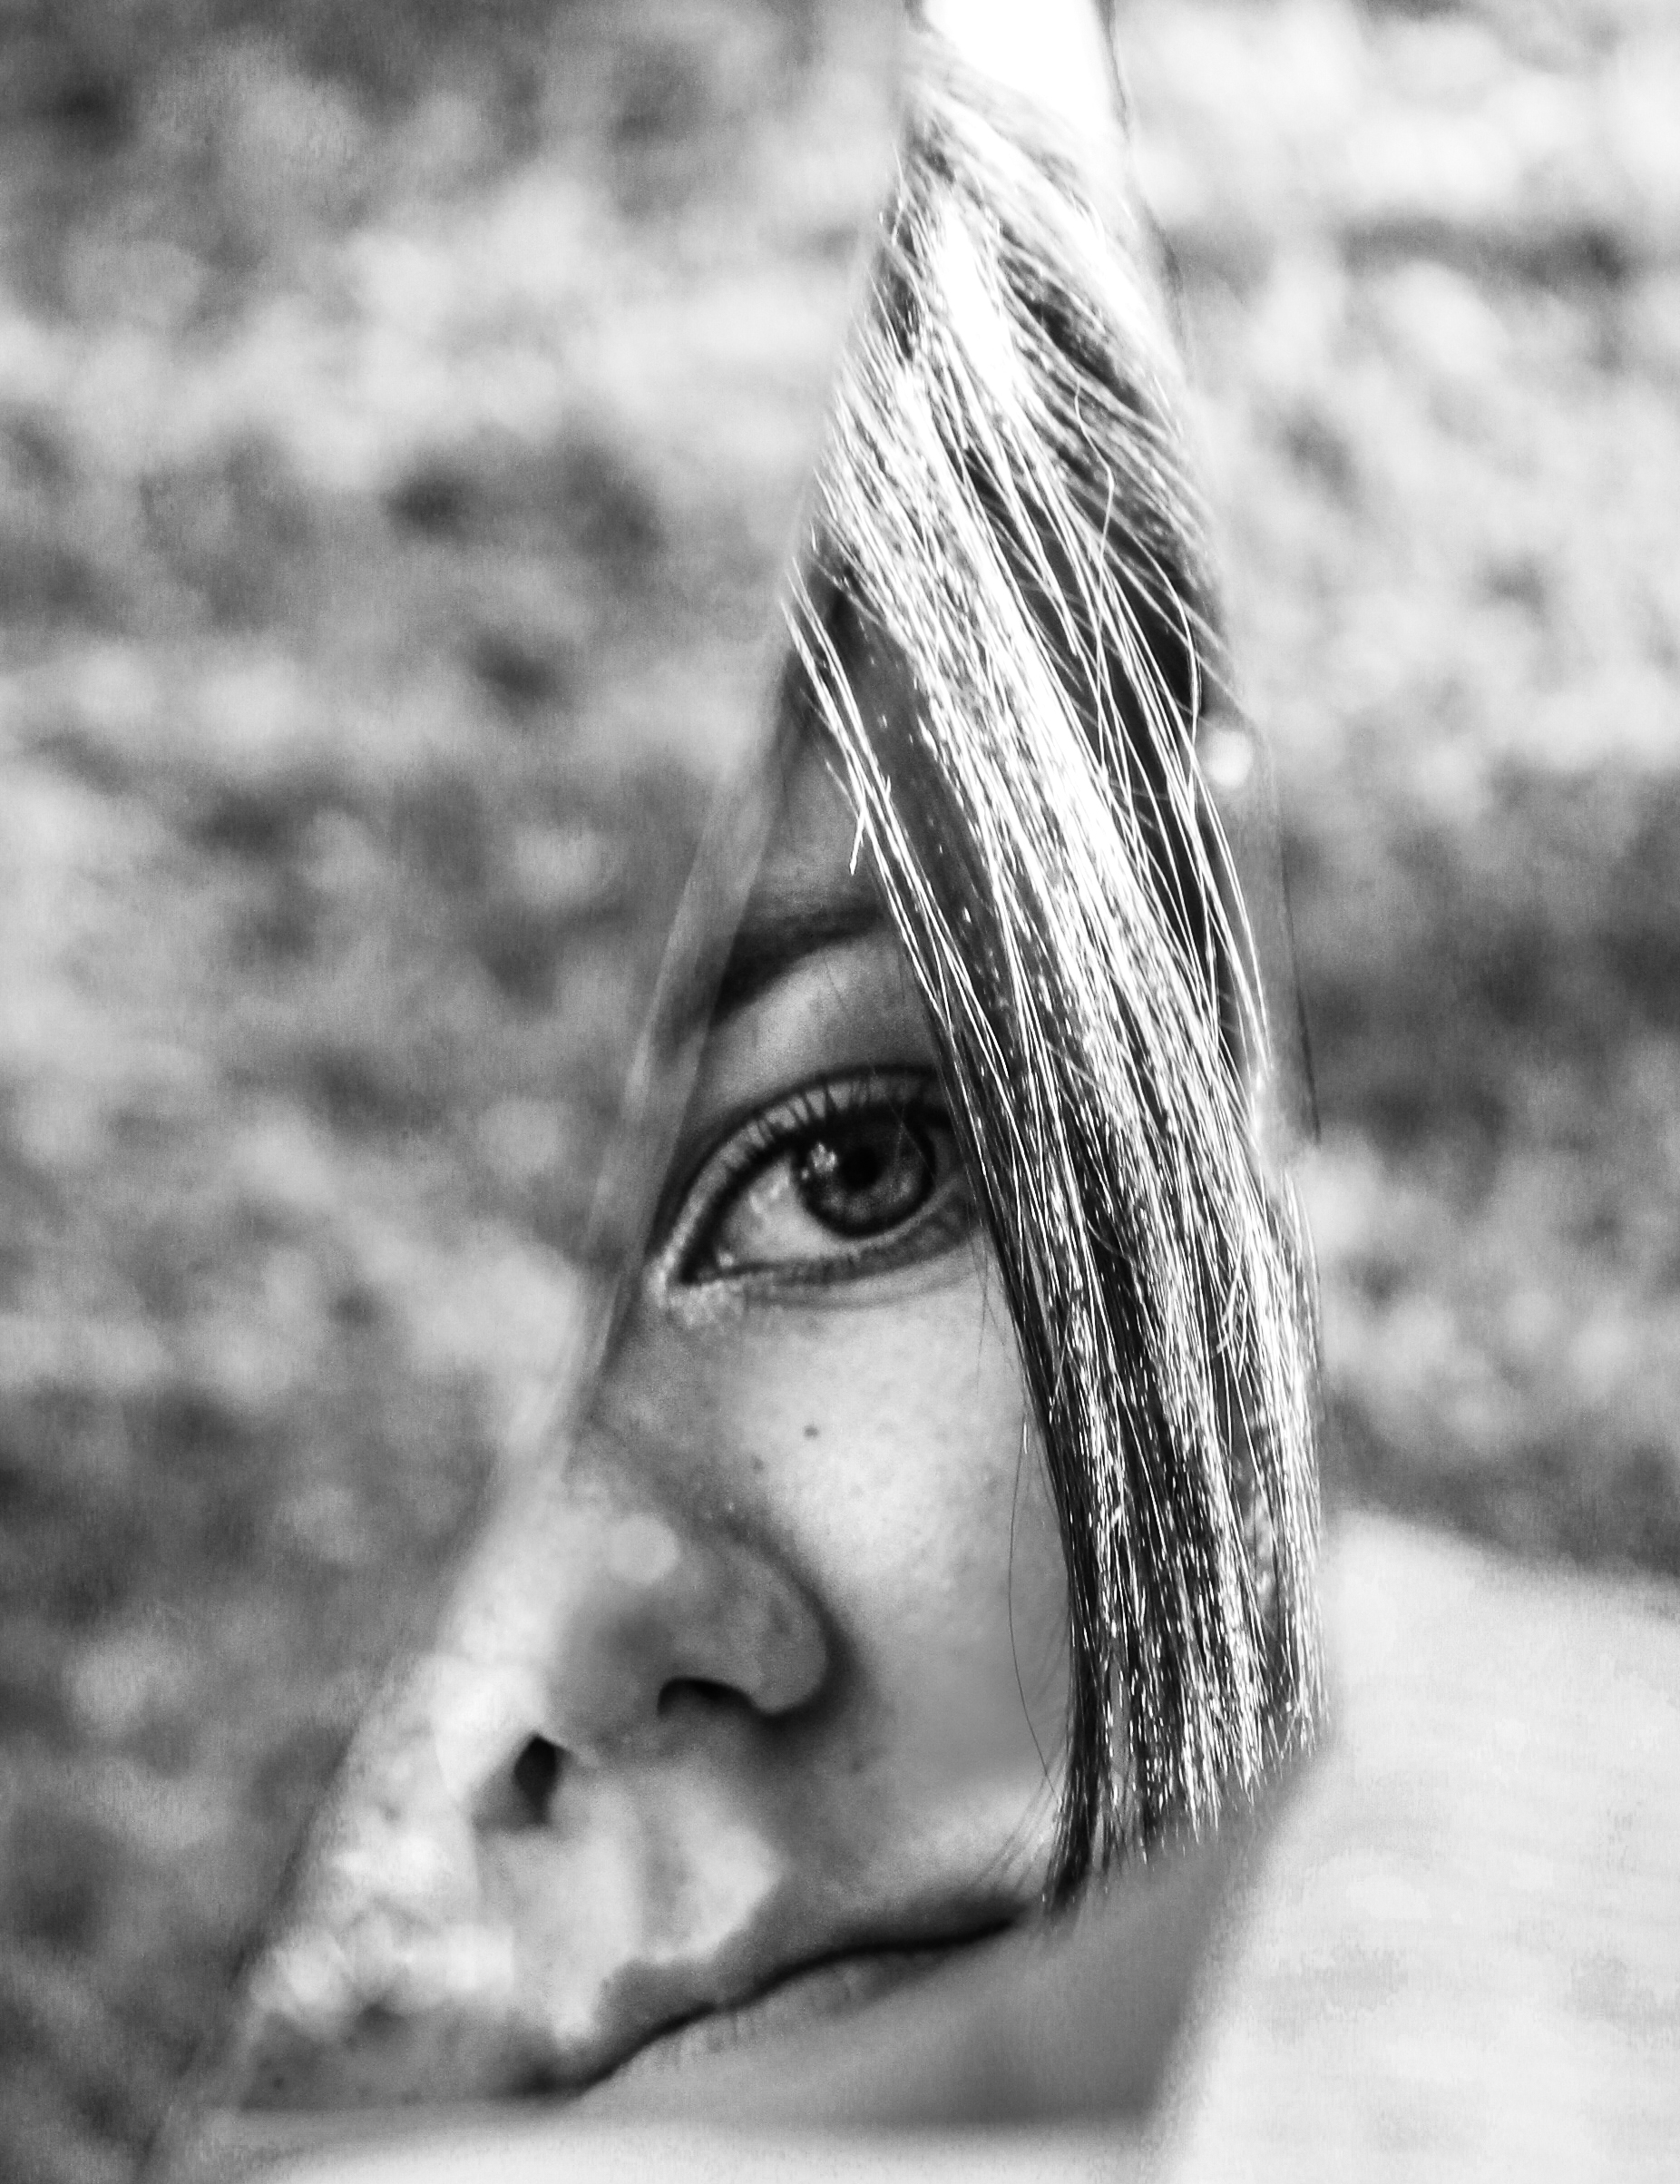 Reflection_HM_Maddie DeLana